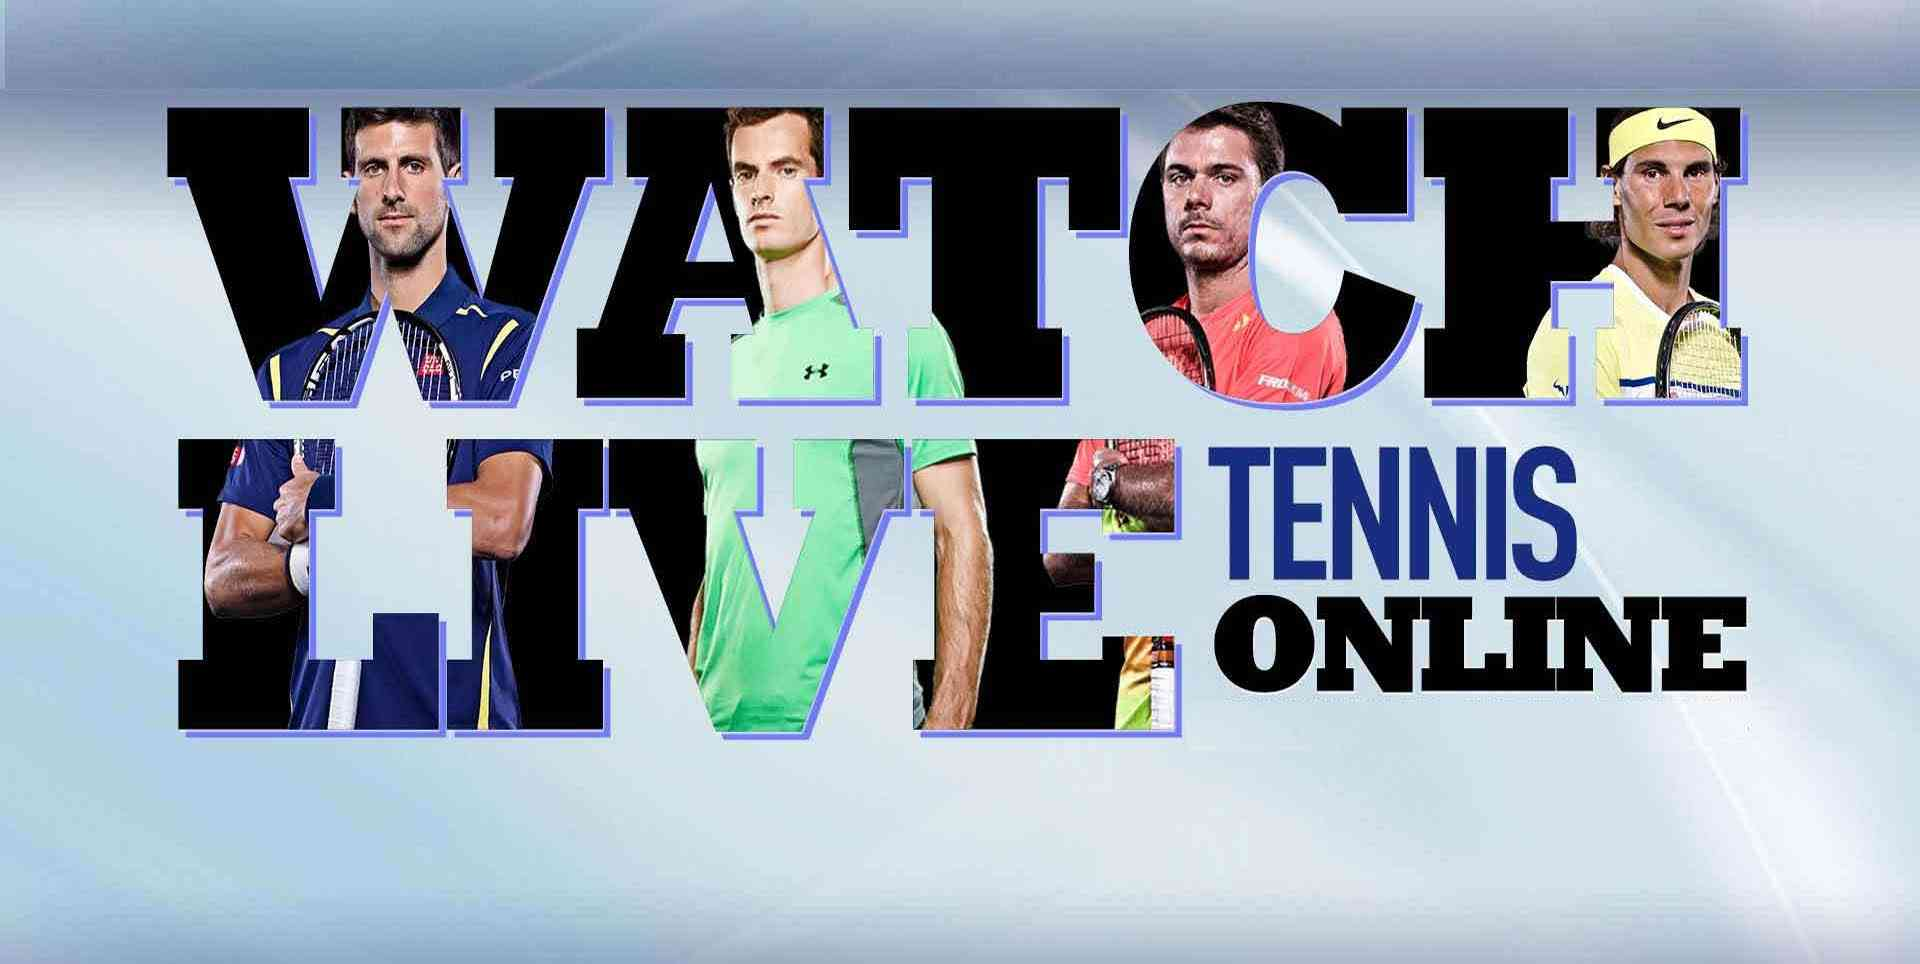 Live D. Ferrer vs P. Andujar Quarterfinals Online